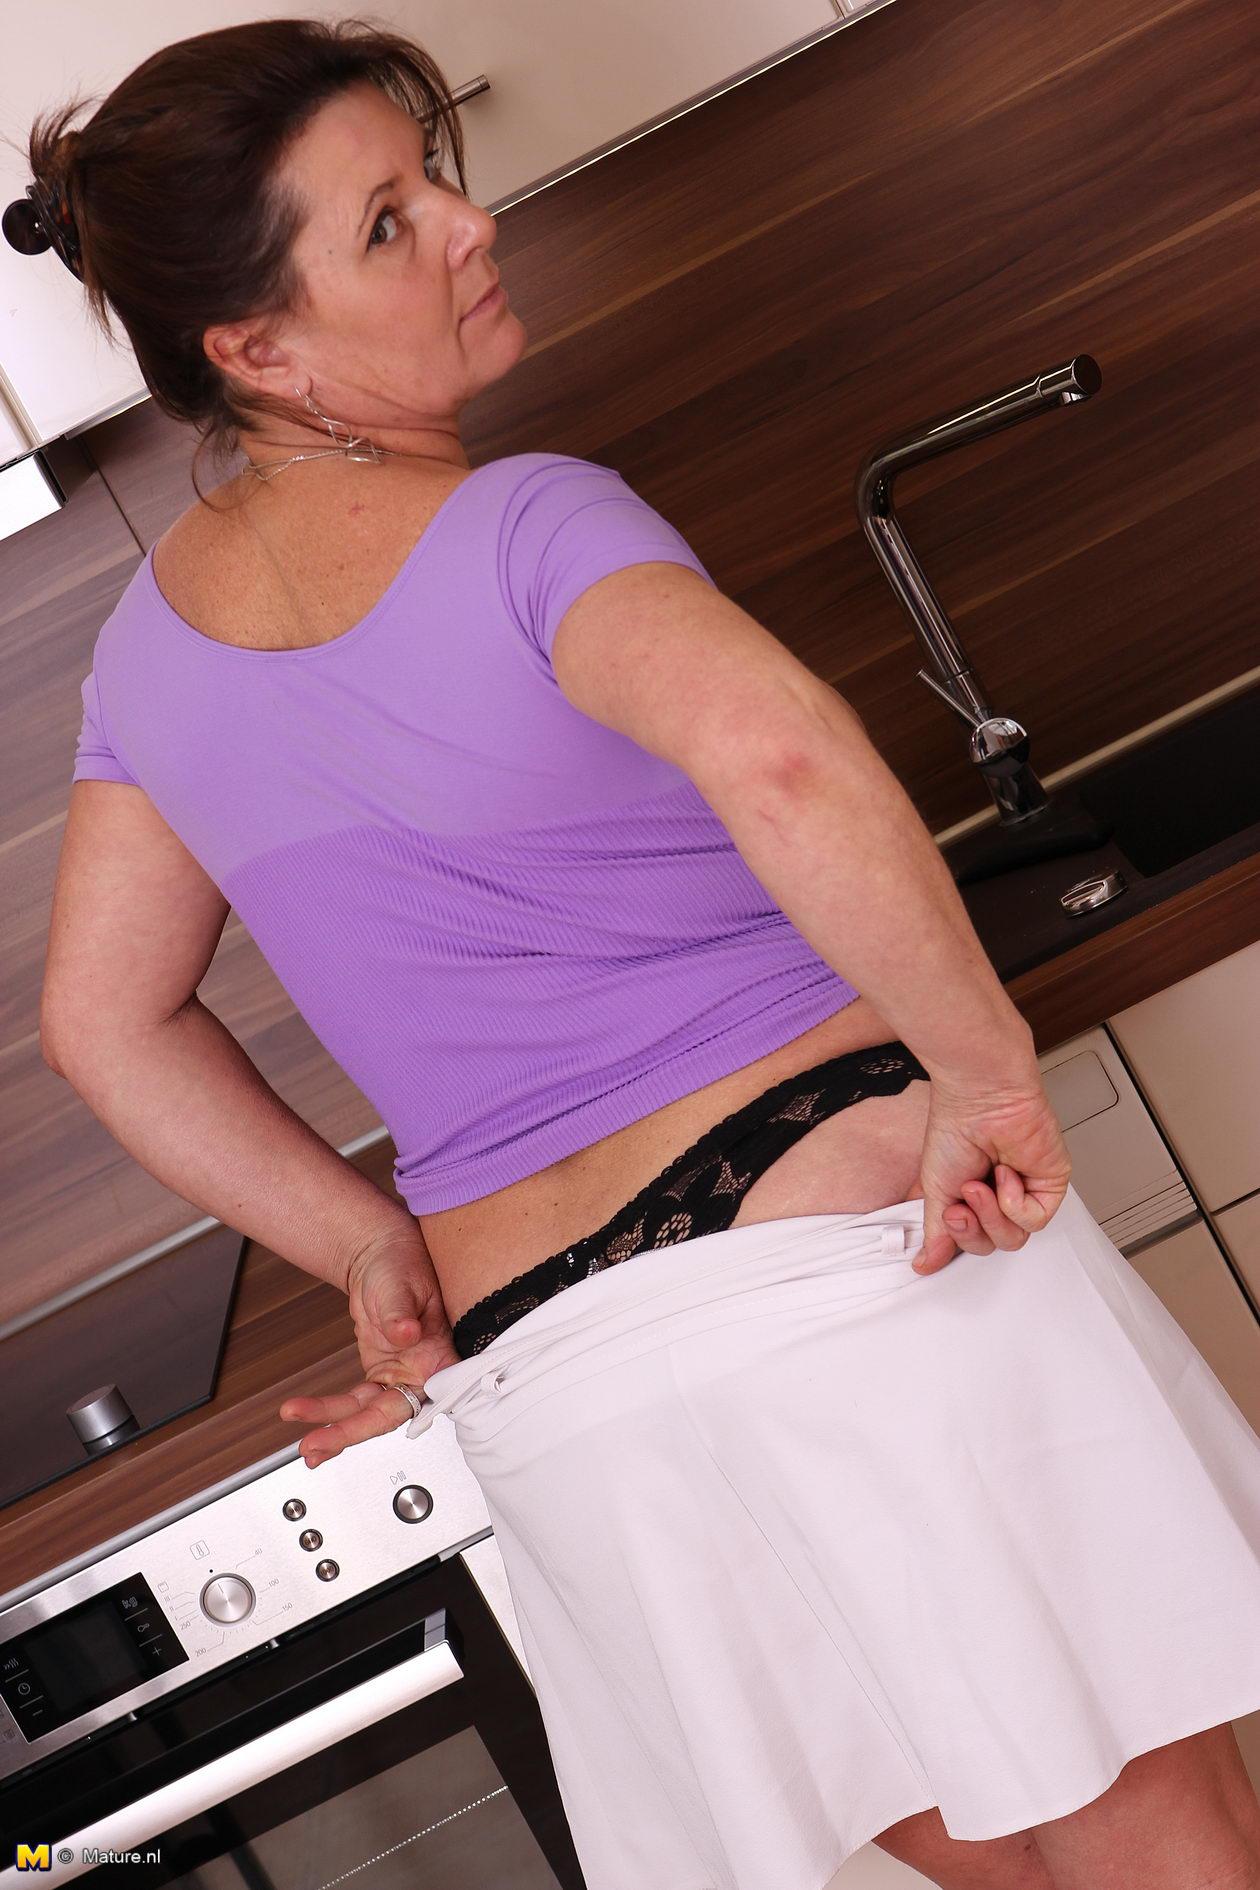 Mature women kitchen nude